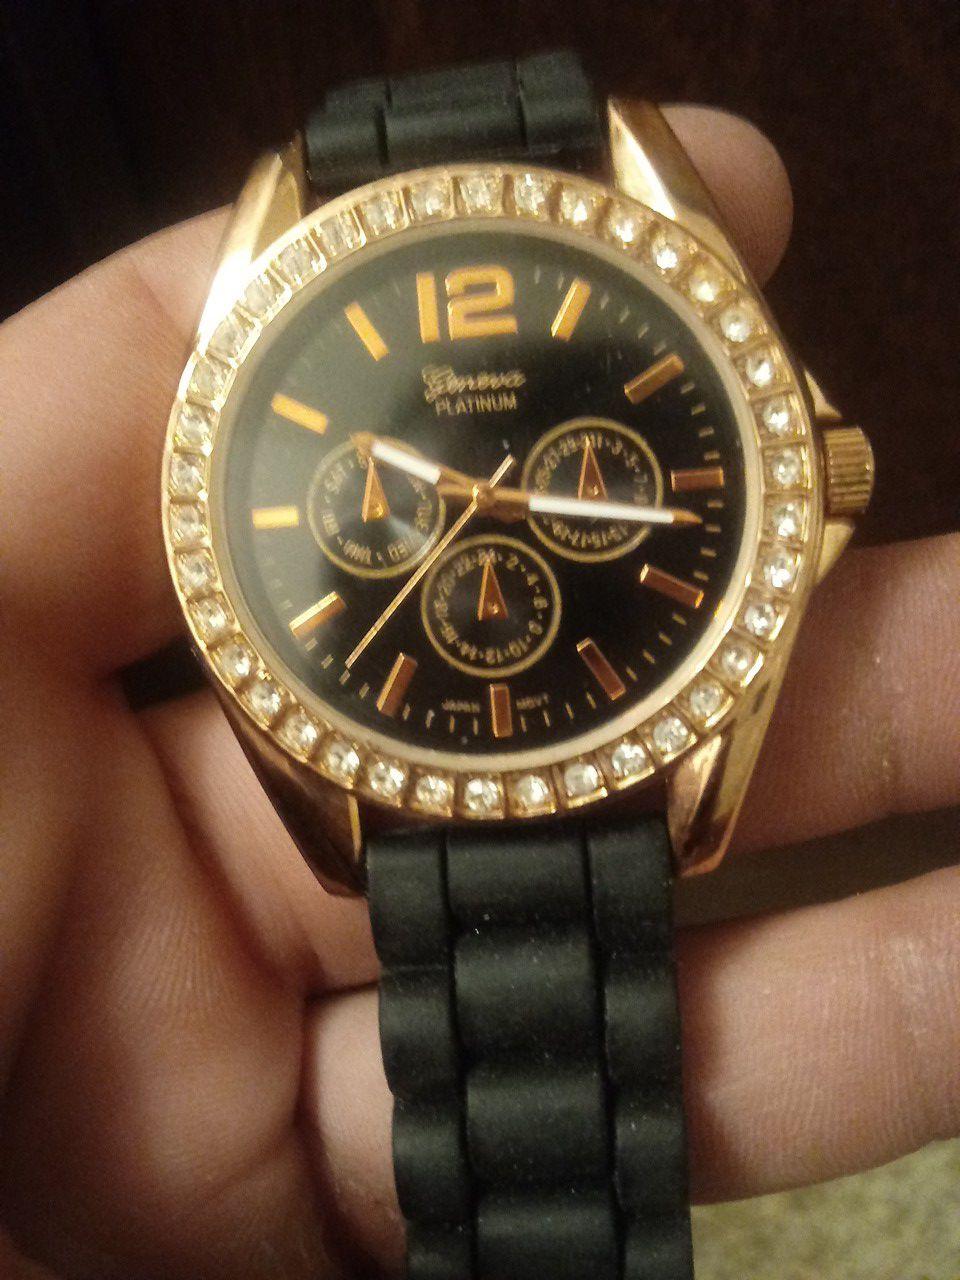 Geneva Platinum watch NO 7846